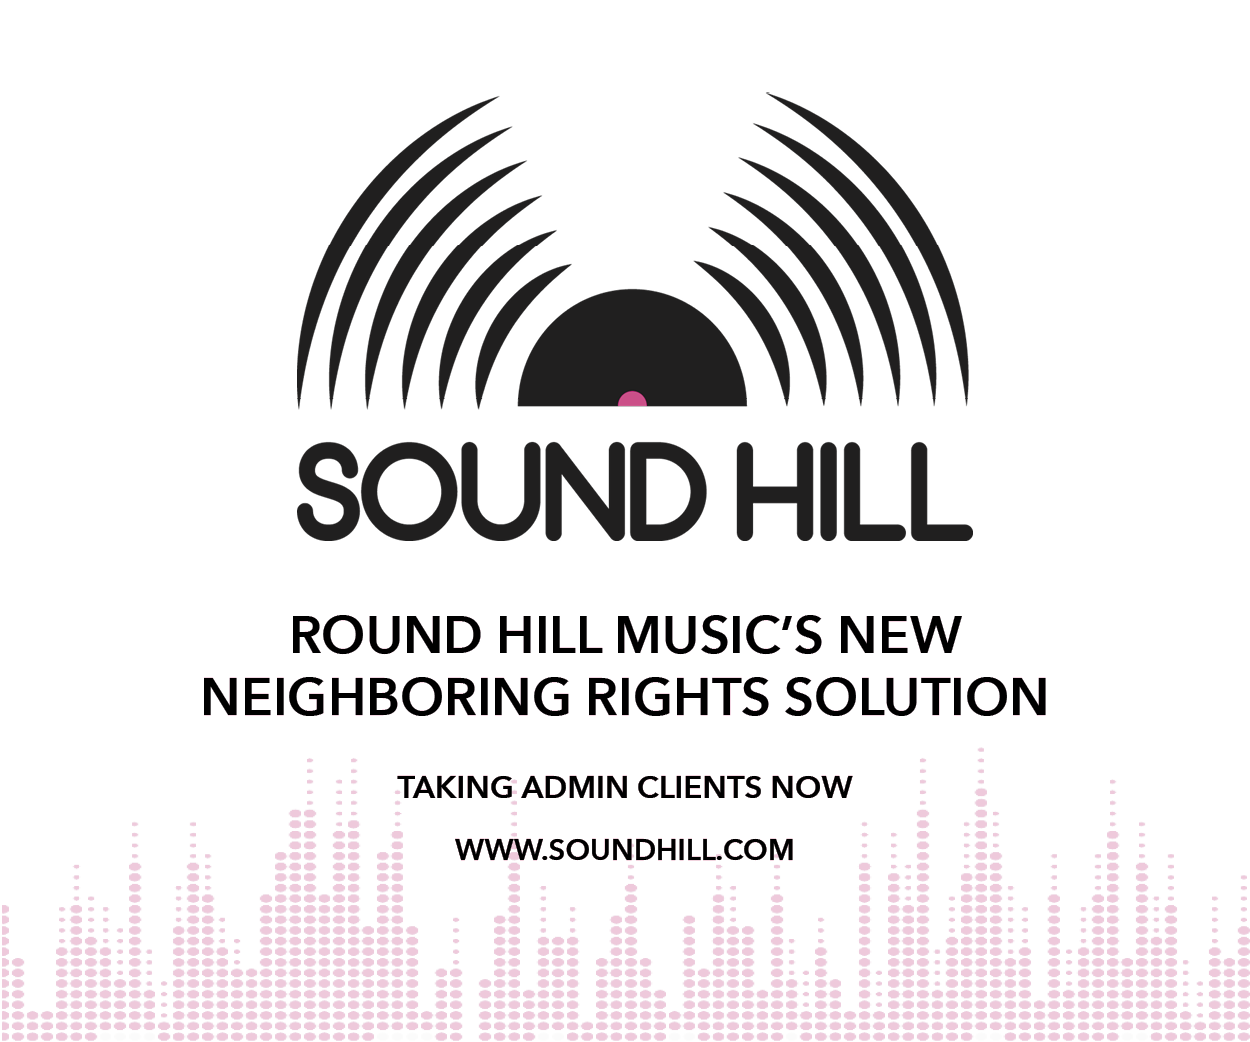 soundhill